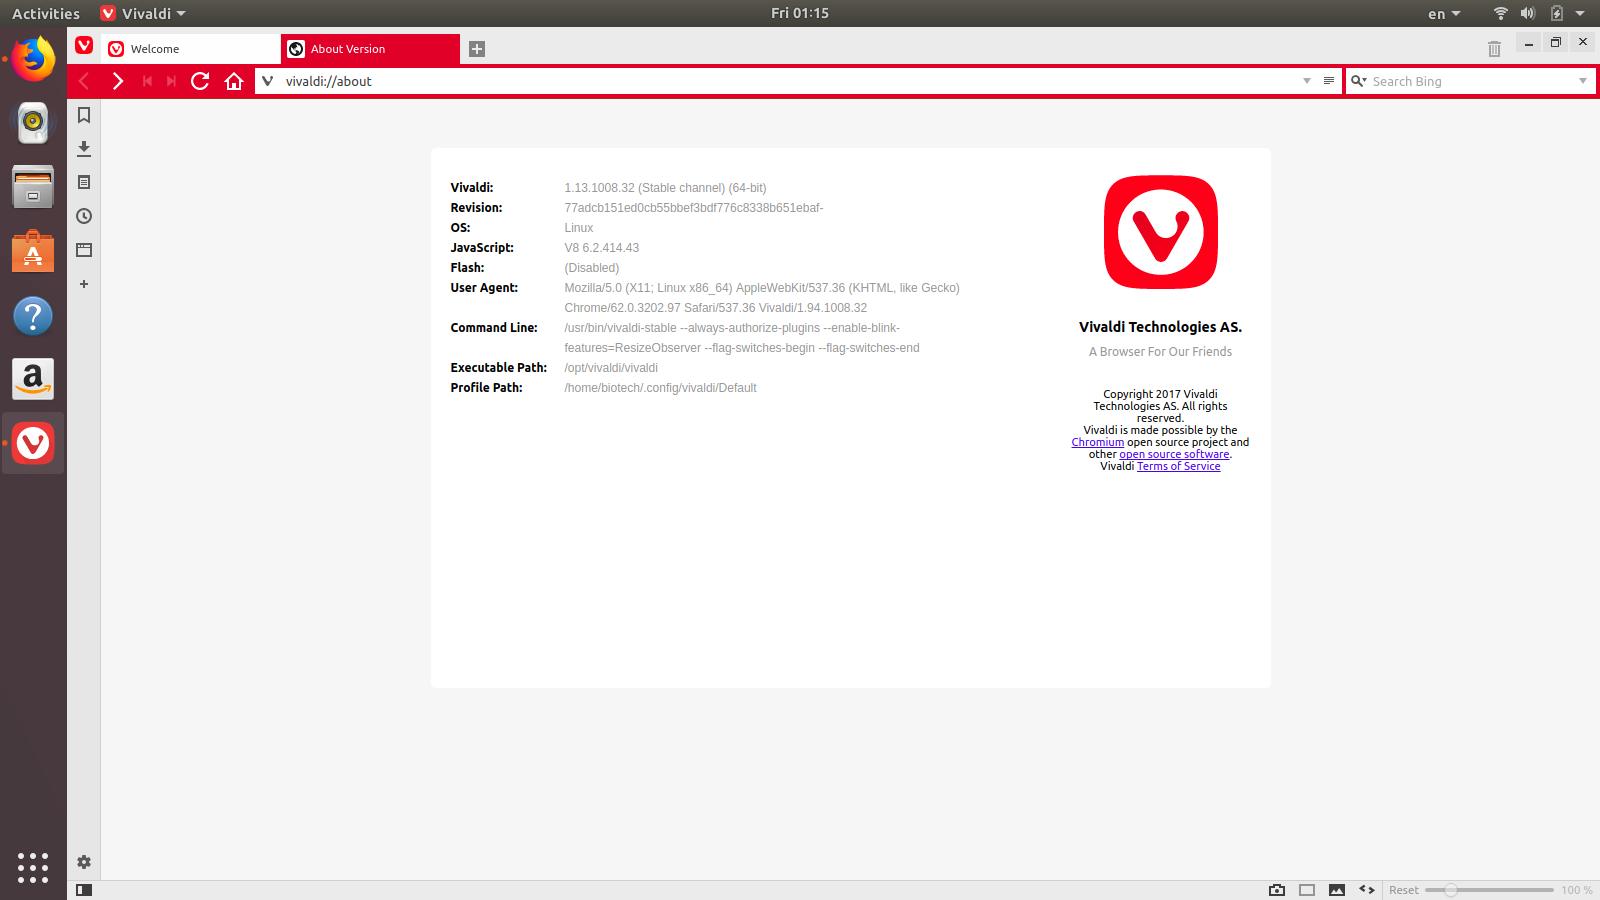 How to install program on Ubuntu: How to install Vivaldi